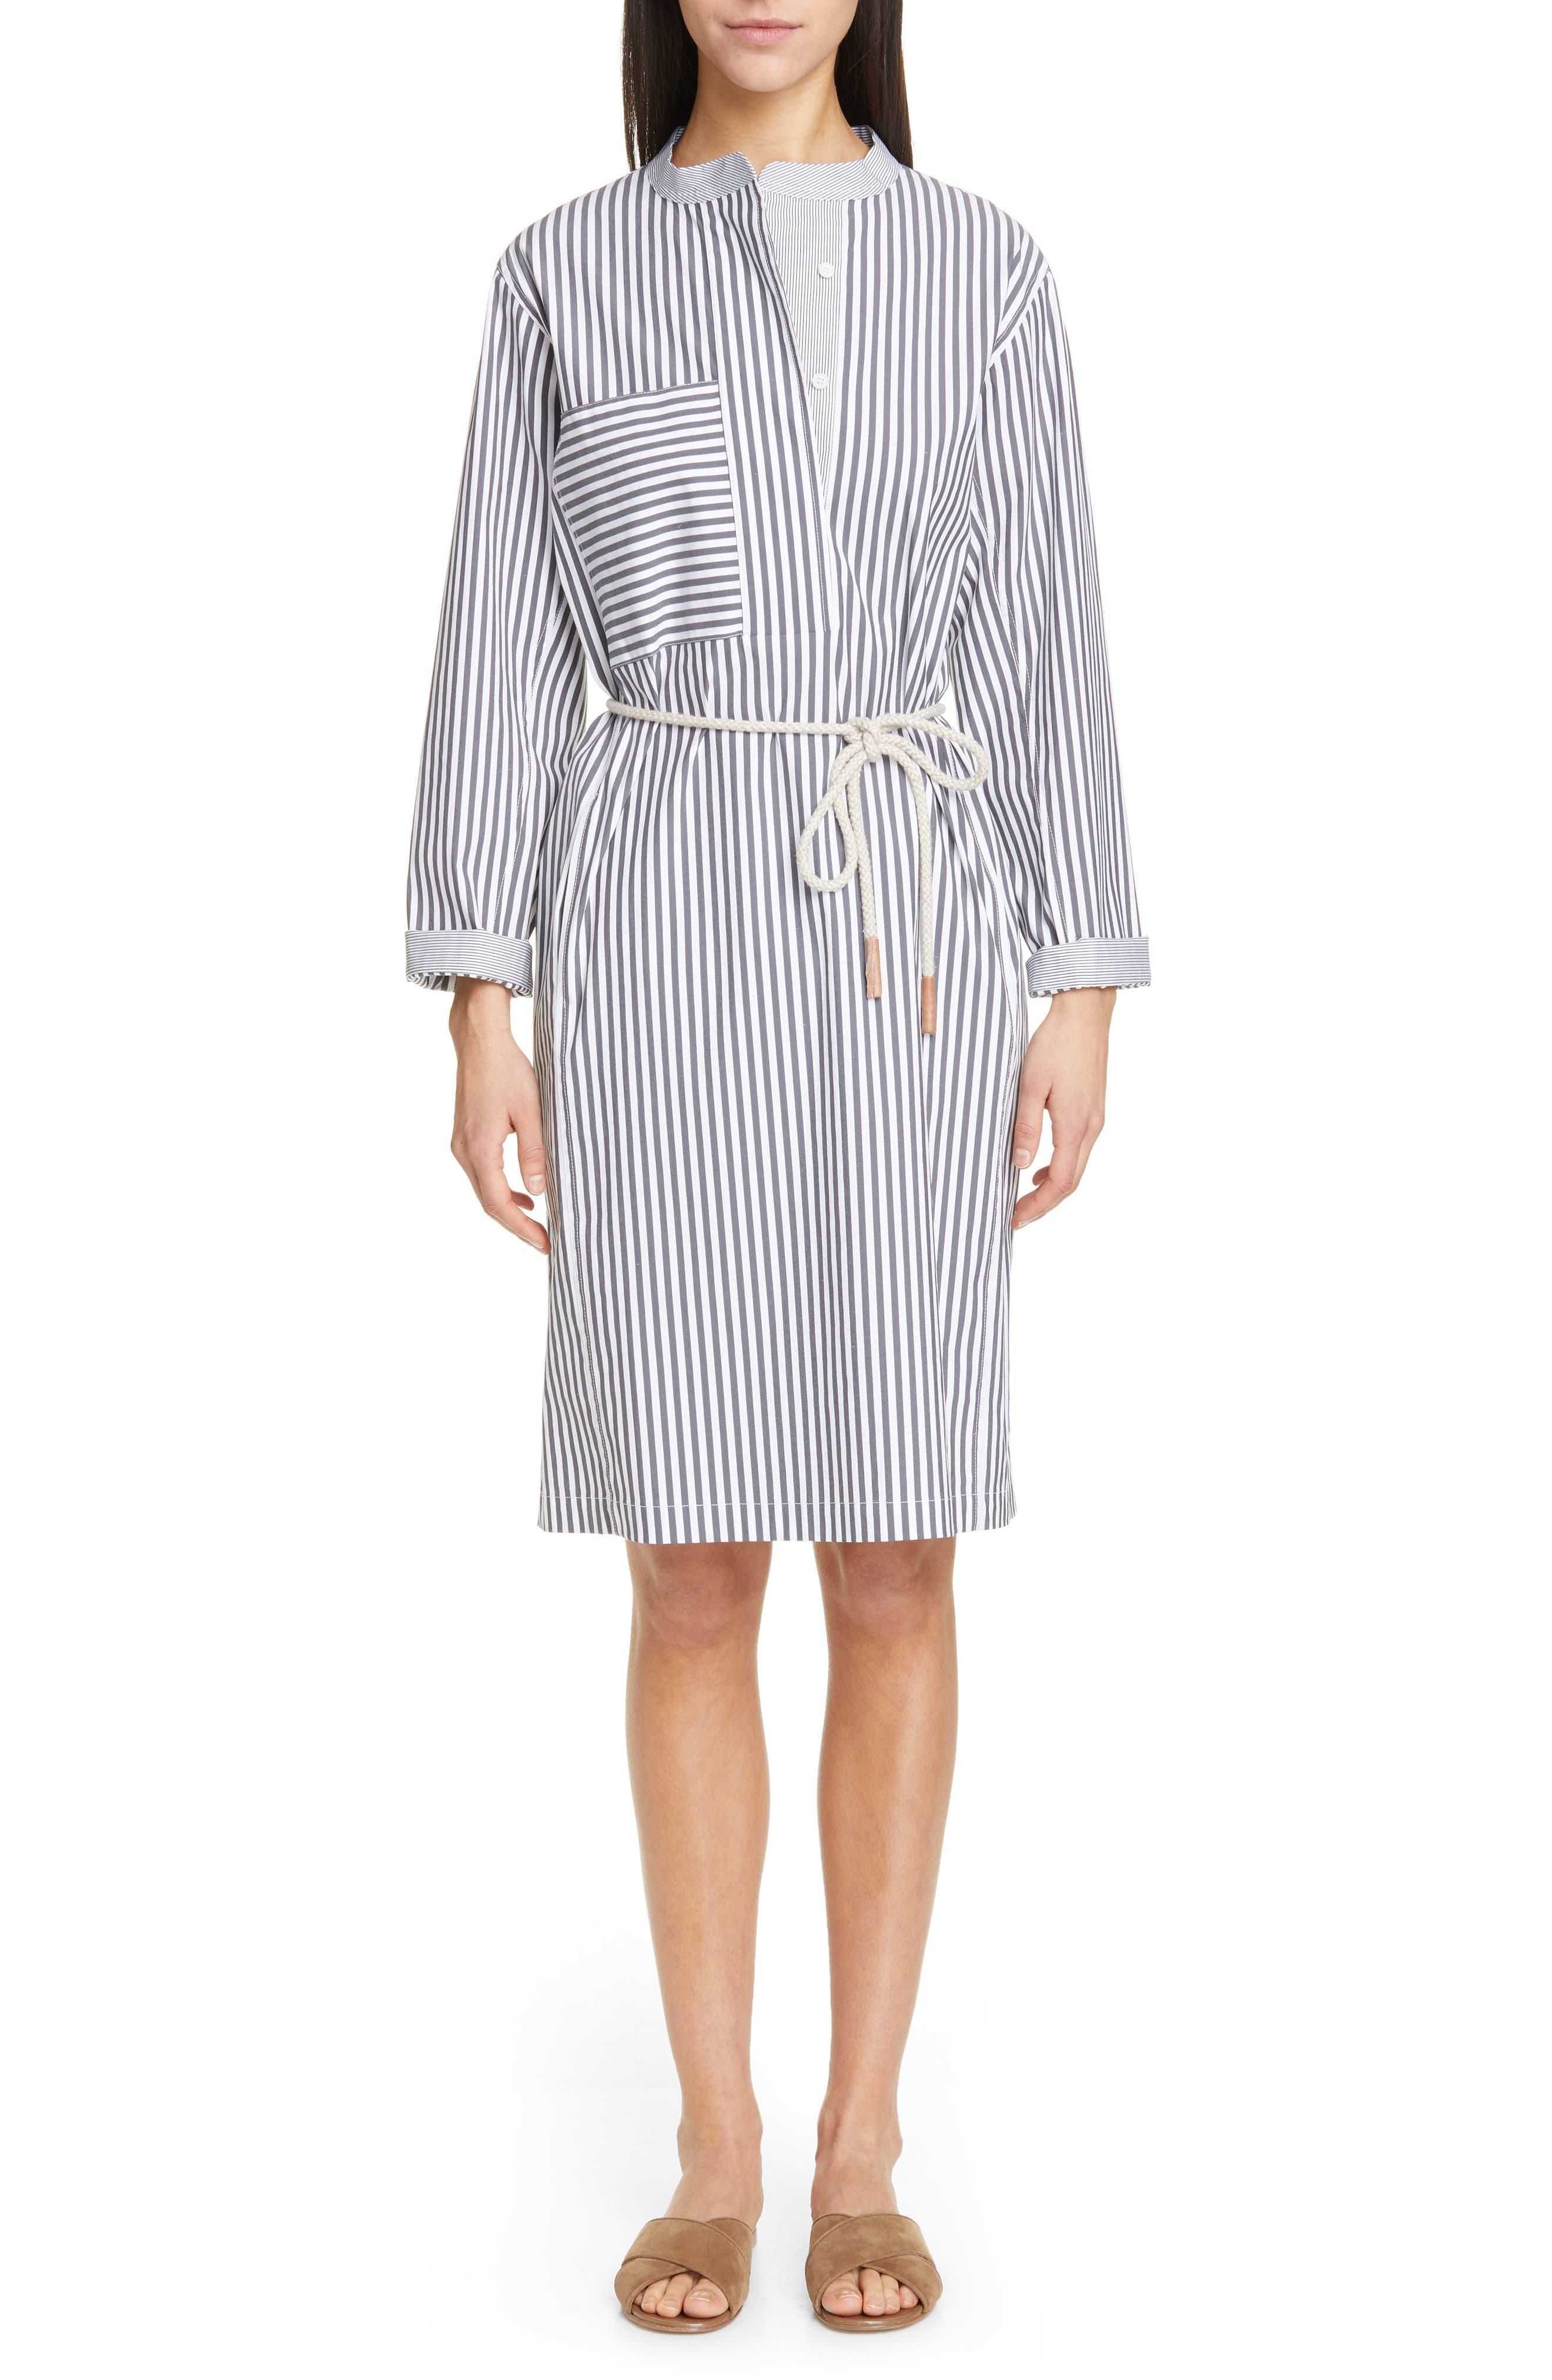 LAFAYETTE 148 NEW YORK, Rexana Stripe Long Sleeve Belted Shirtdress, Main thumbnail 1, color, ASH MULTI